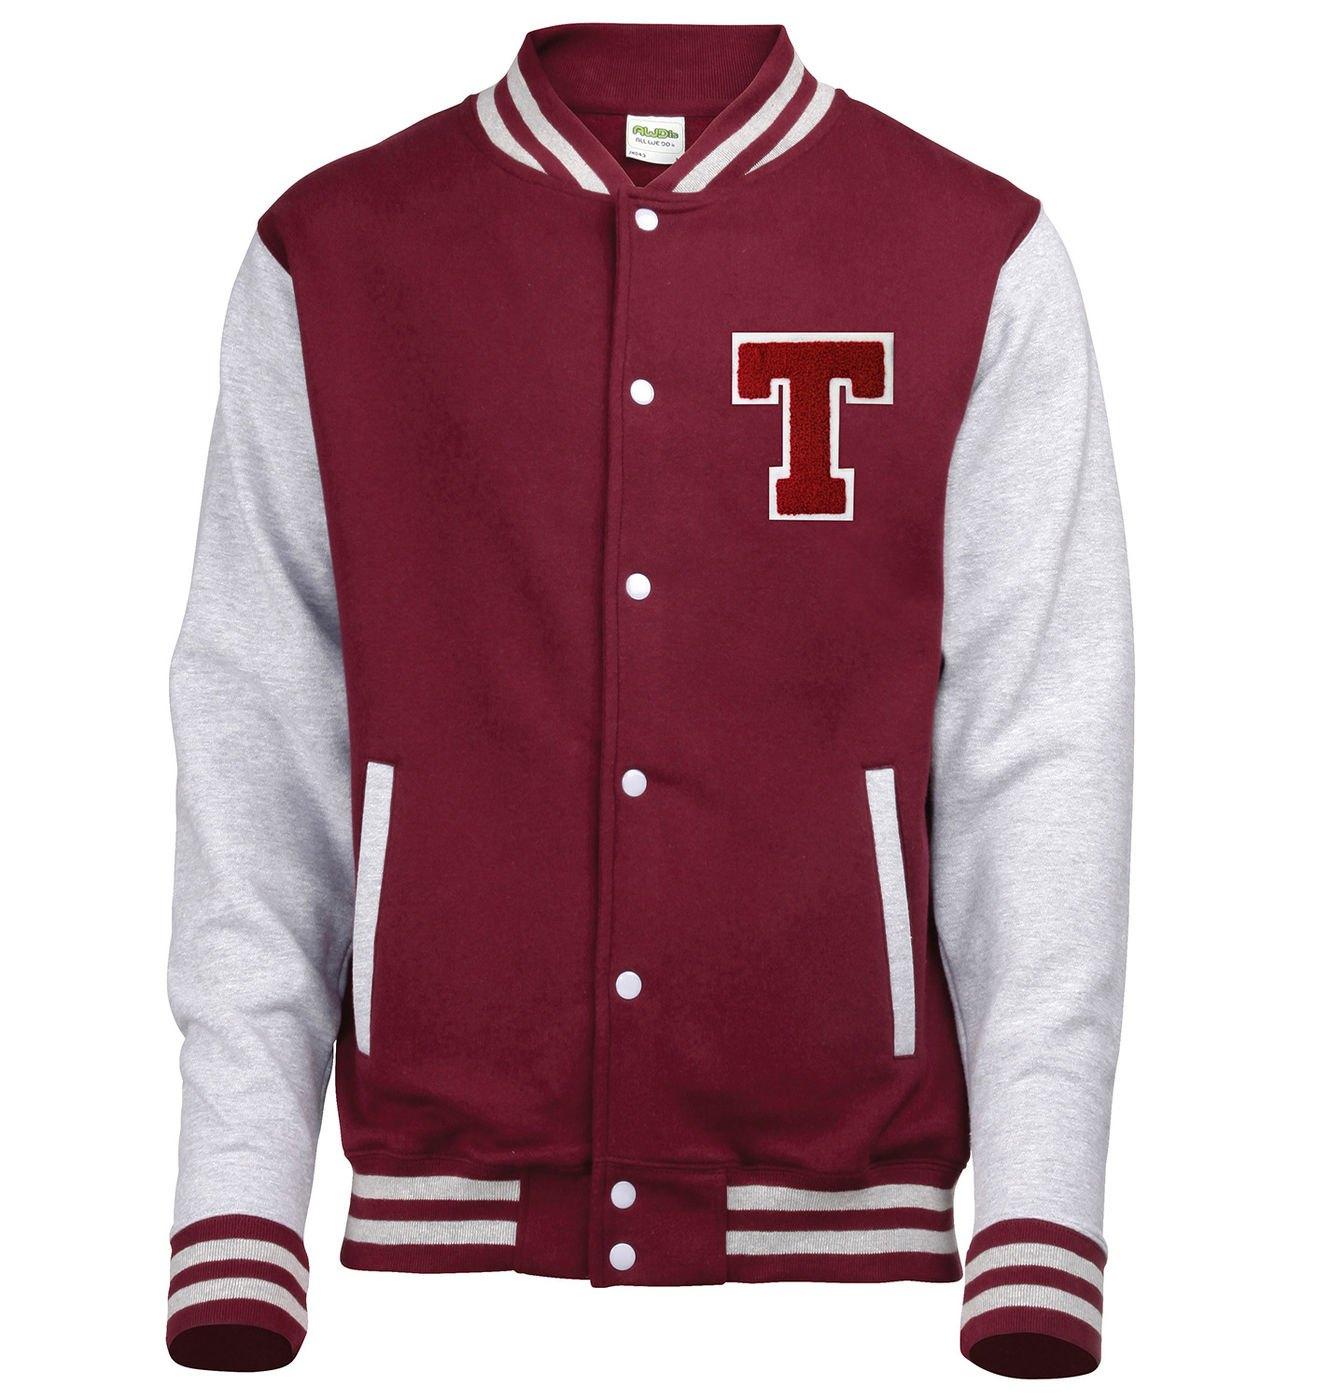 varsity jacket chenille letter tvarsity jacket With chenille letters for varsity jackets